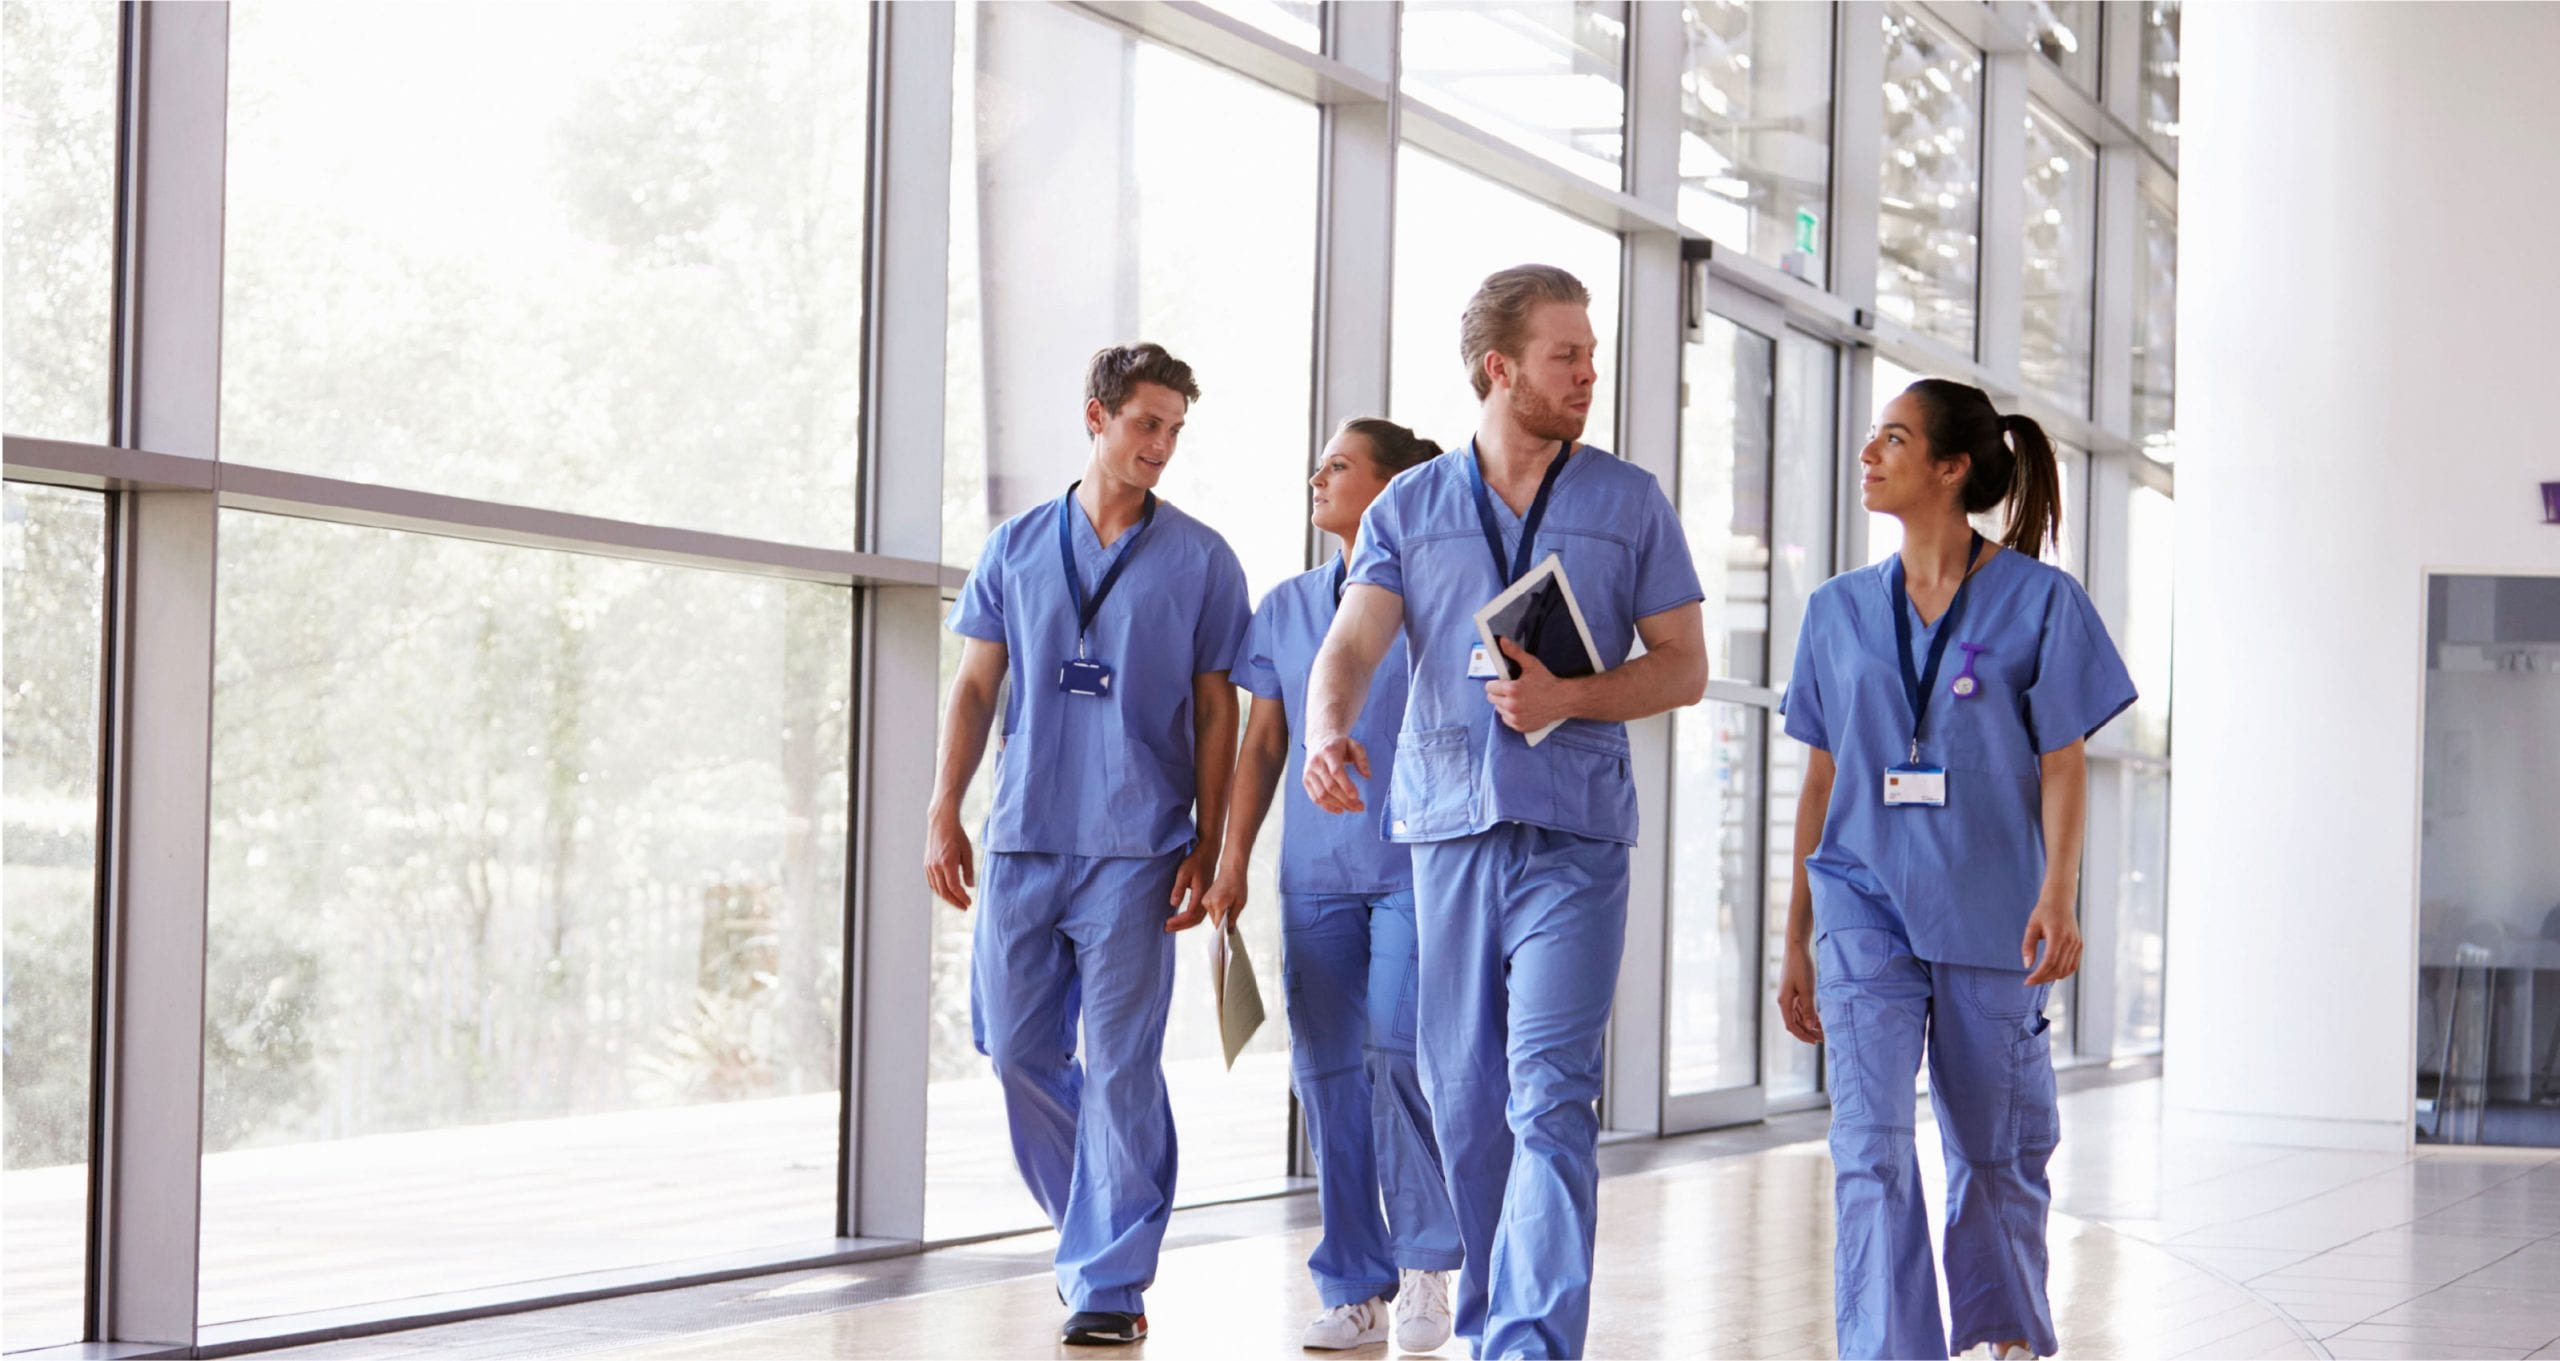 four Doctors in Scrubs